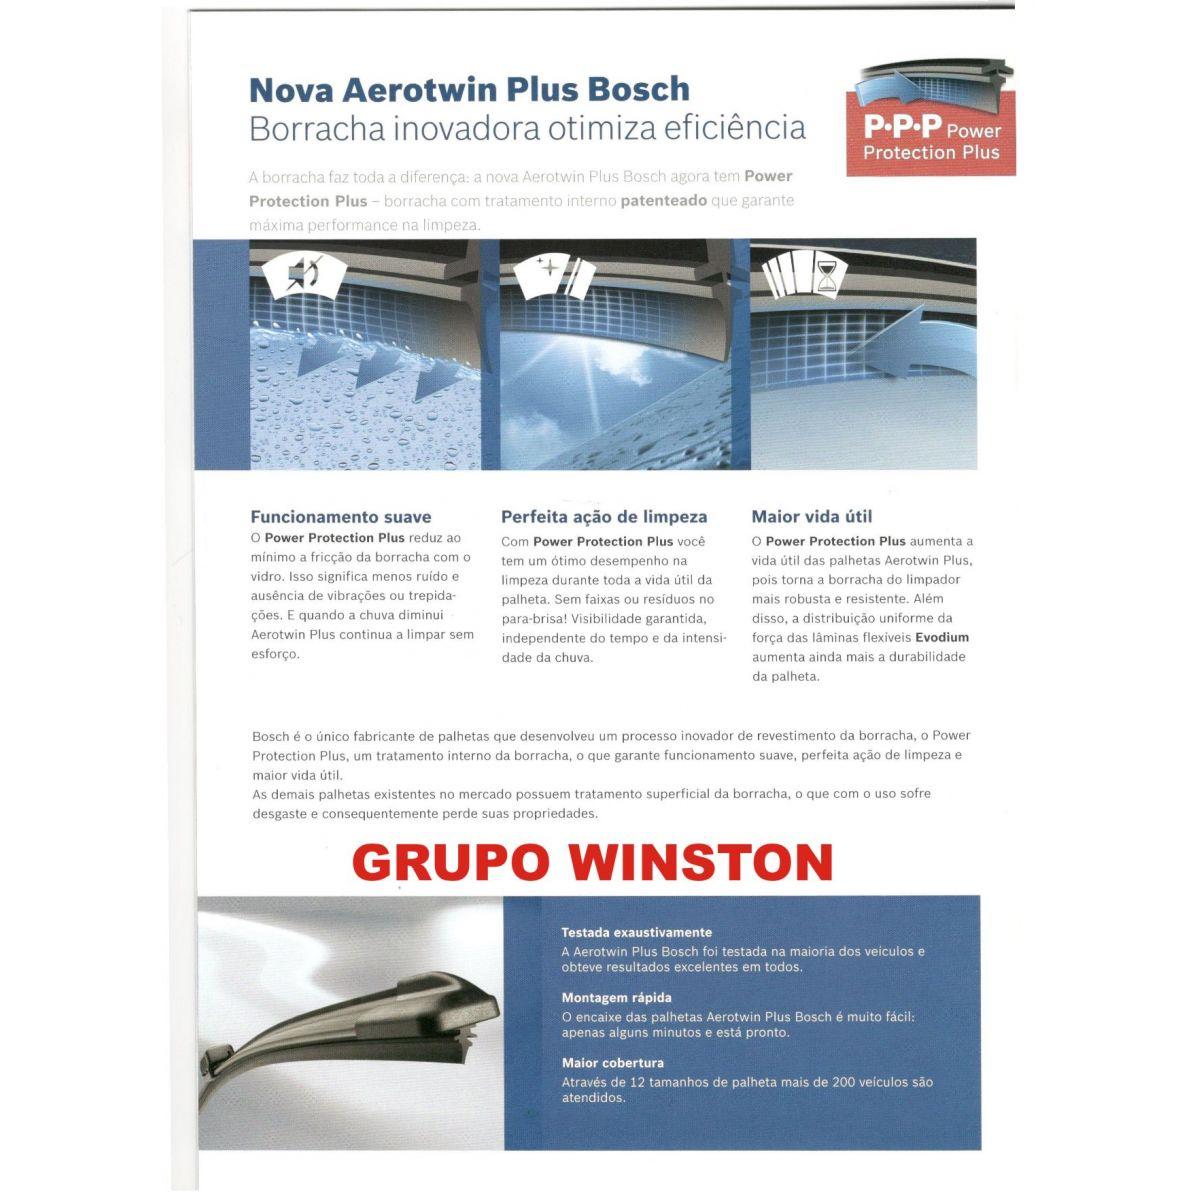 Palheta Bosch Aerotwin Plus Limpador de para brisa Bosch Citreon C5 ano 2008 até 2010